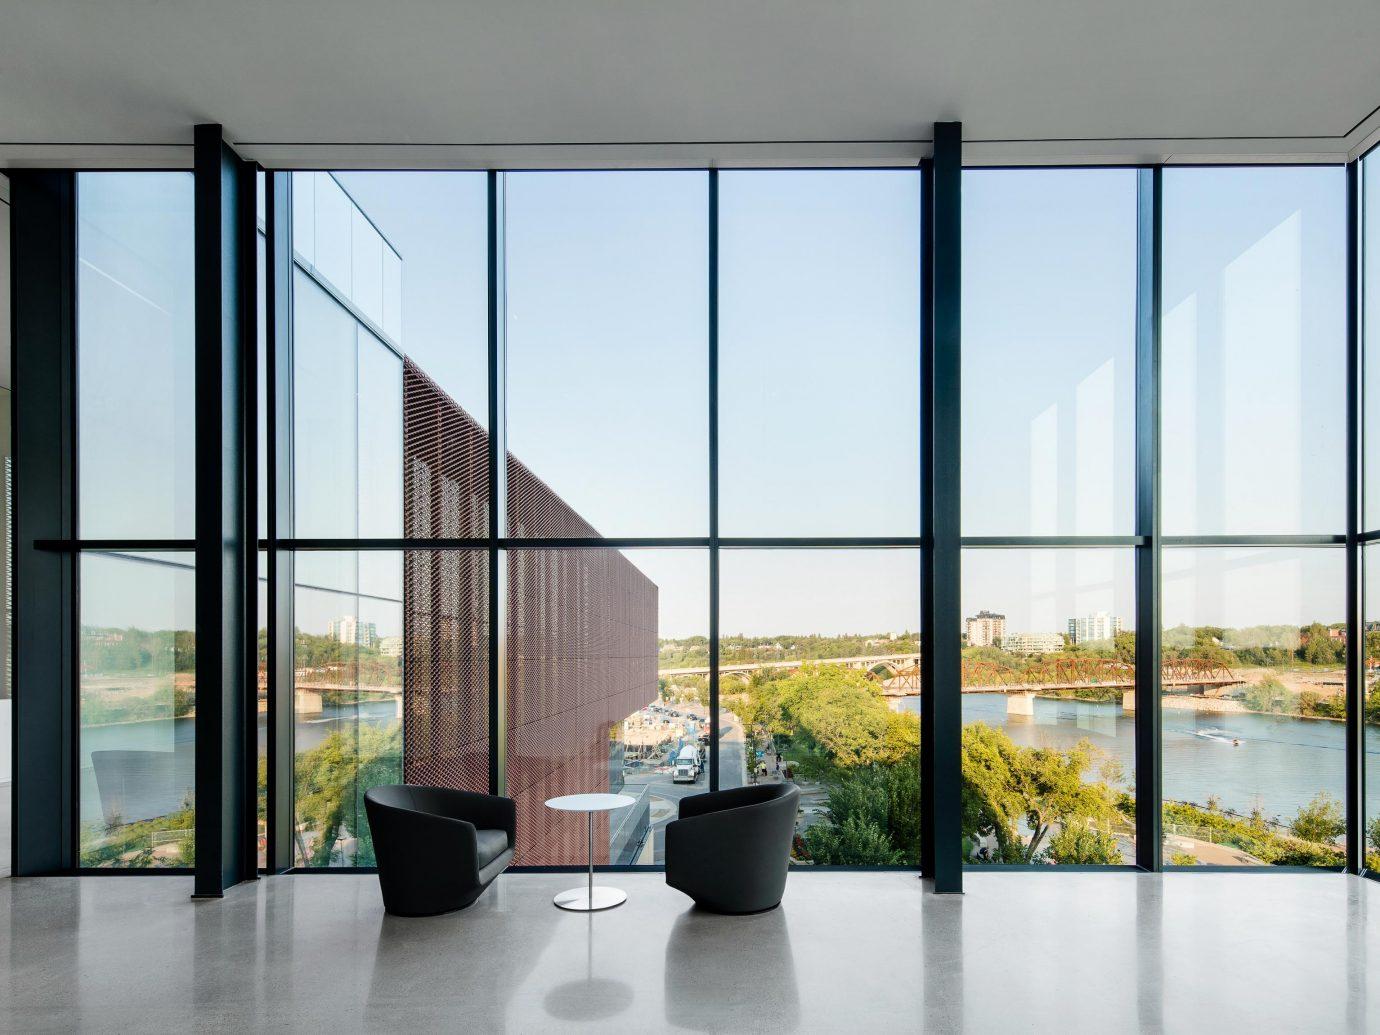 Remai Modern, Saskatoon, Saskatchewan museum interior view window